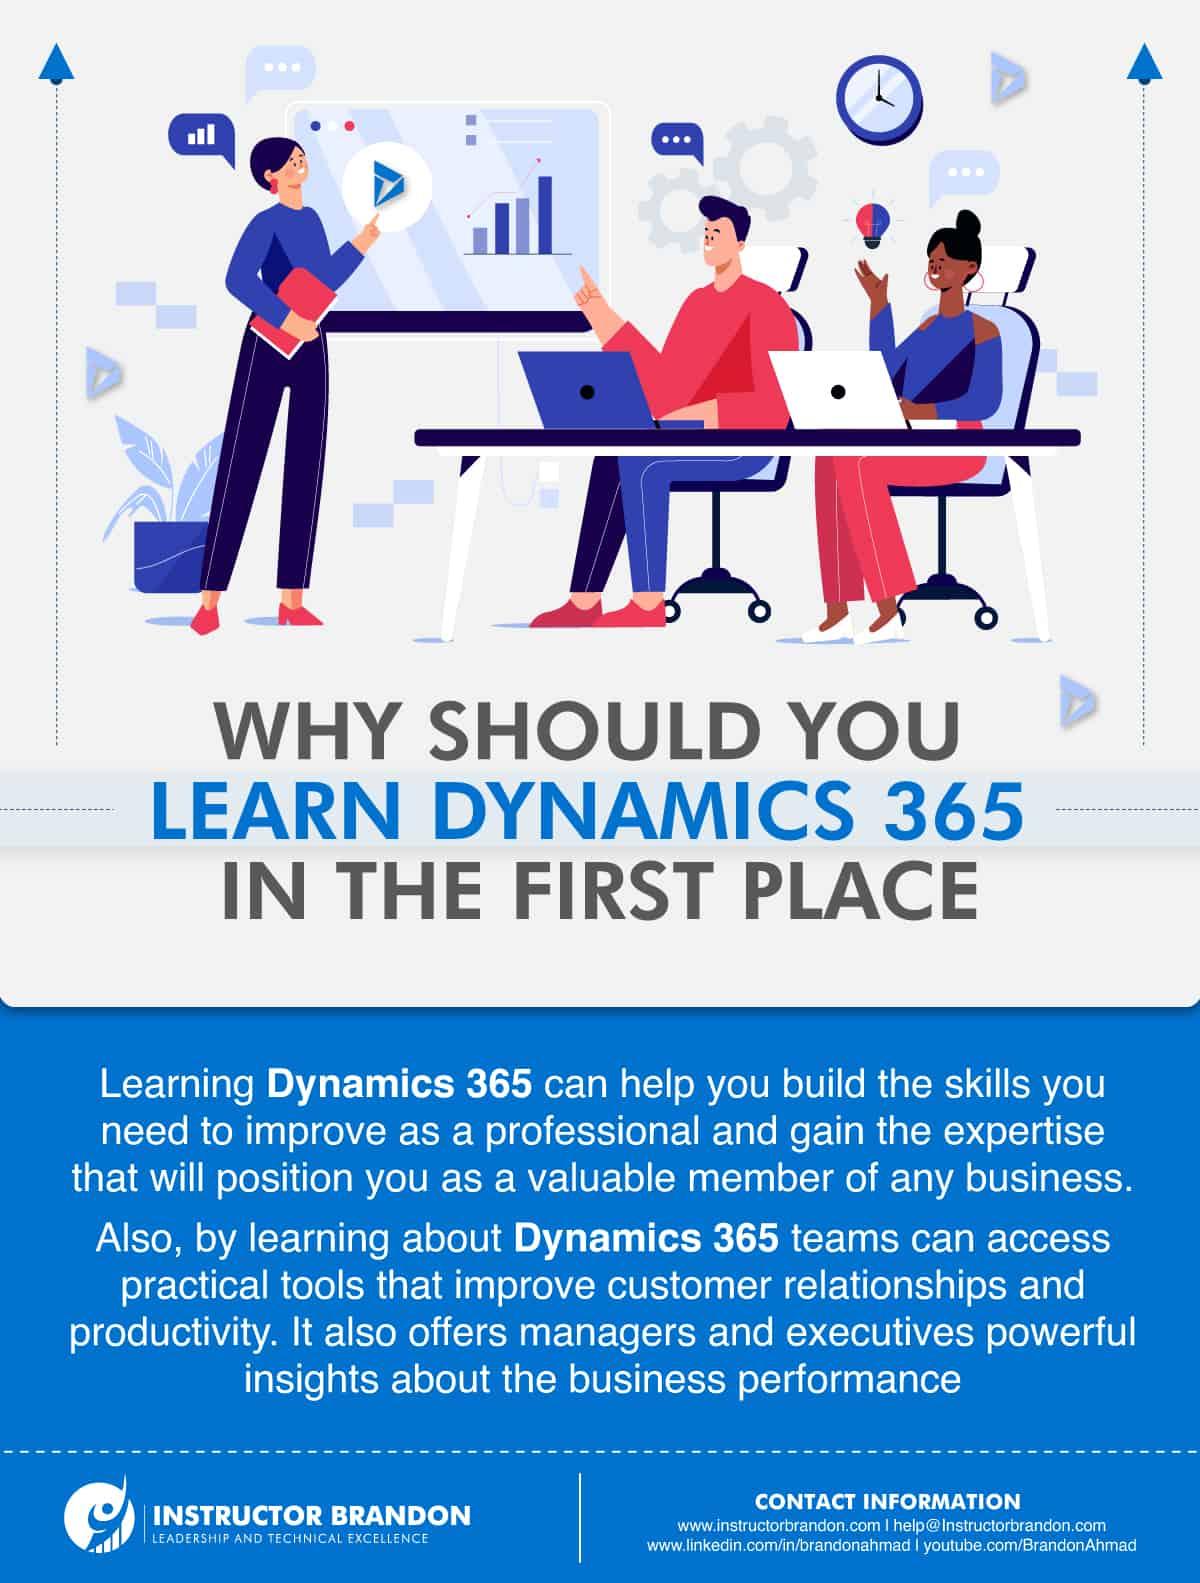 Why should you learn Microsoft Dynamics 365?